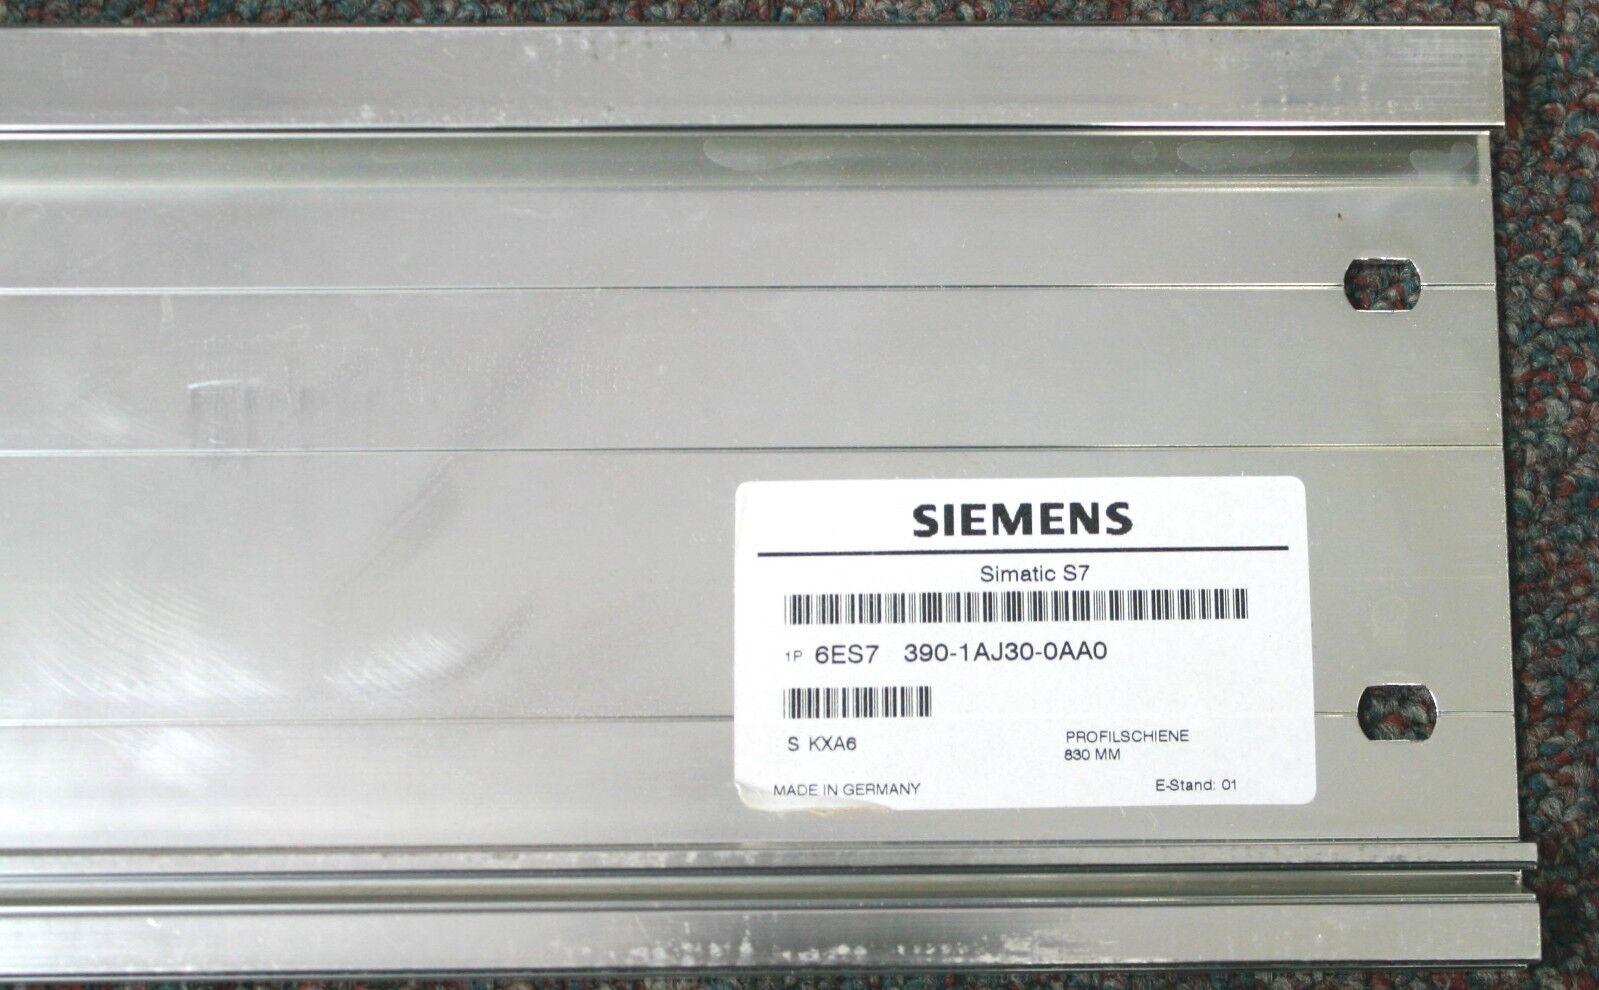 SIEMENS 6ES7 390-1AJ30-0AA0 6ES7390-1AJ30-0AA0 SIMATIC S7-300 Rail 830mm